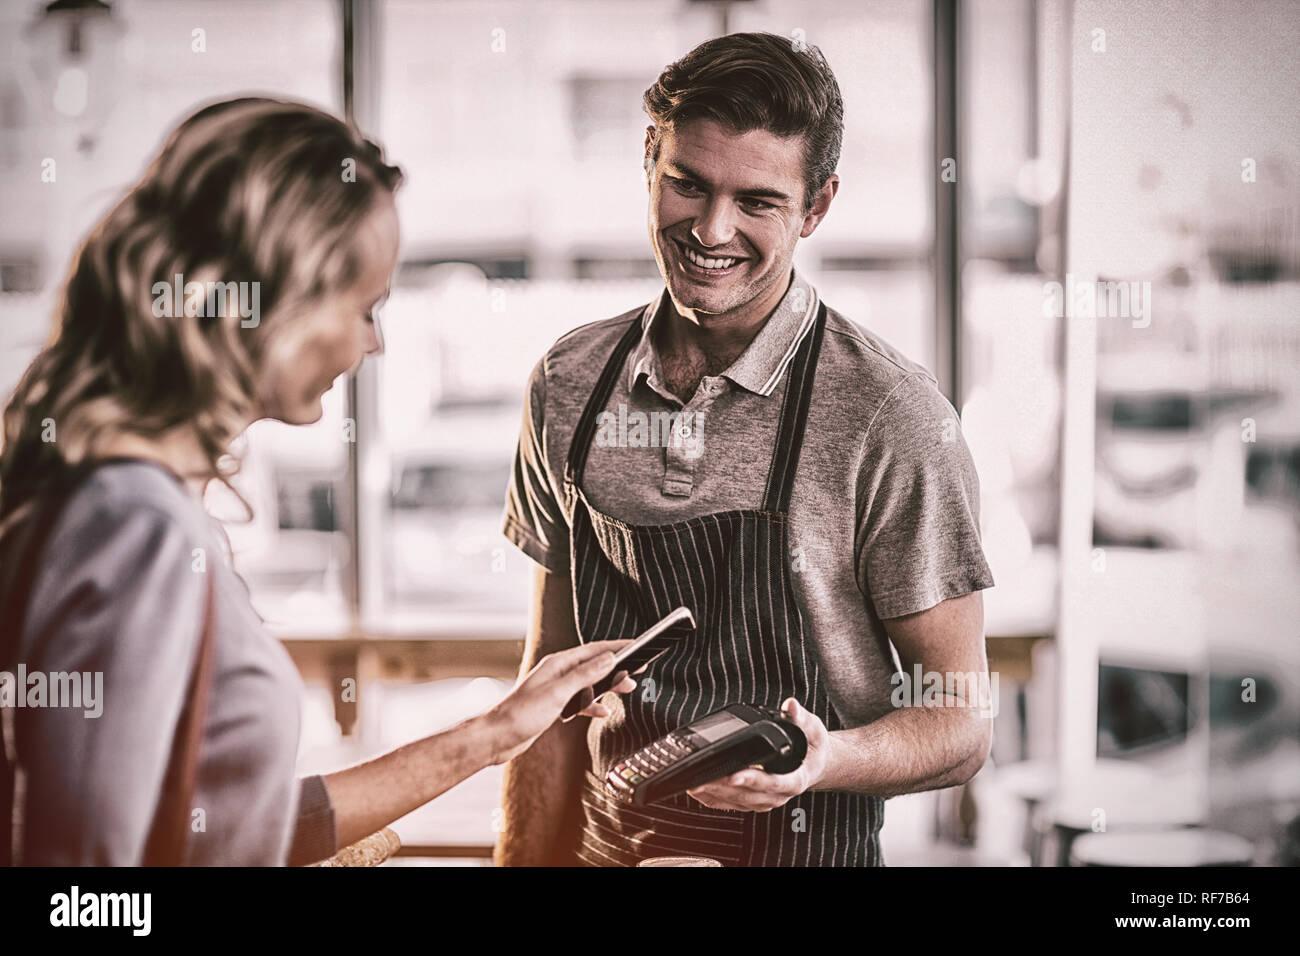 Woman paying bill through smartphone using NFC technology Stock Photo